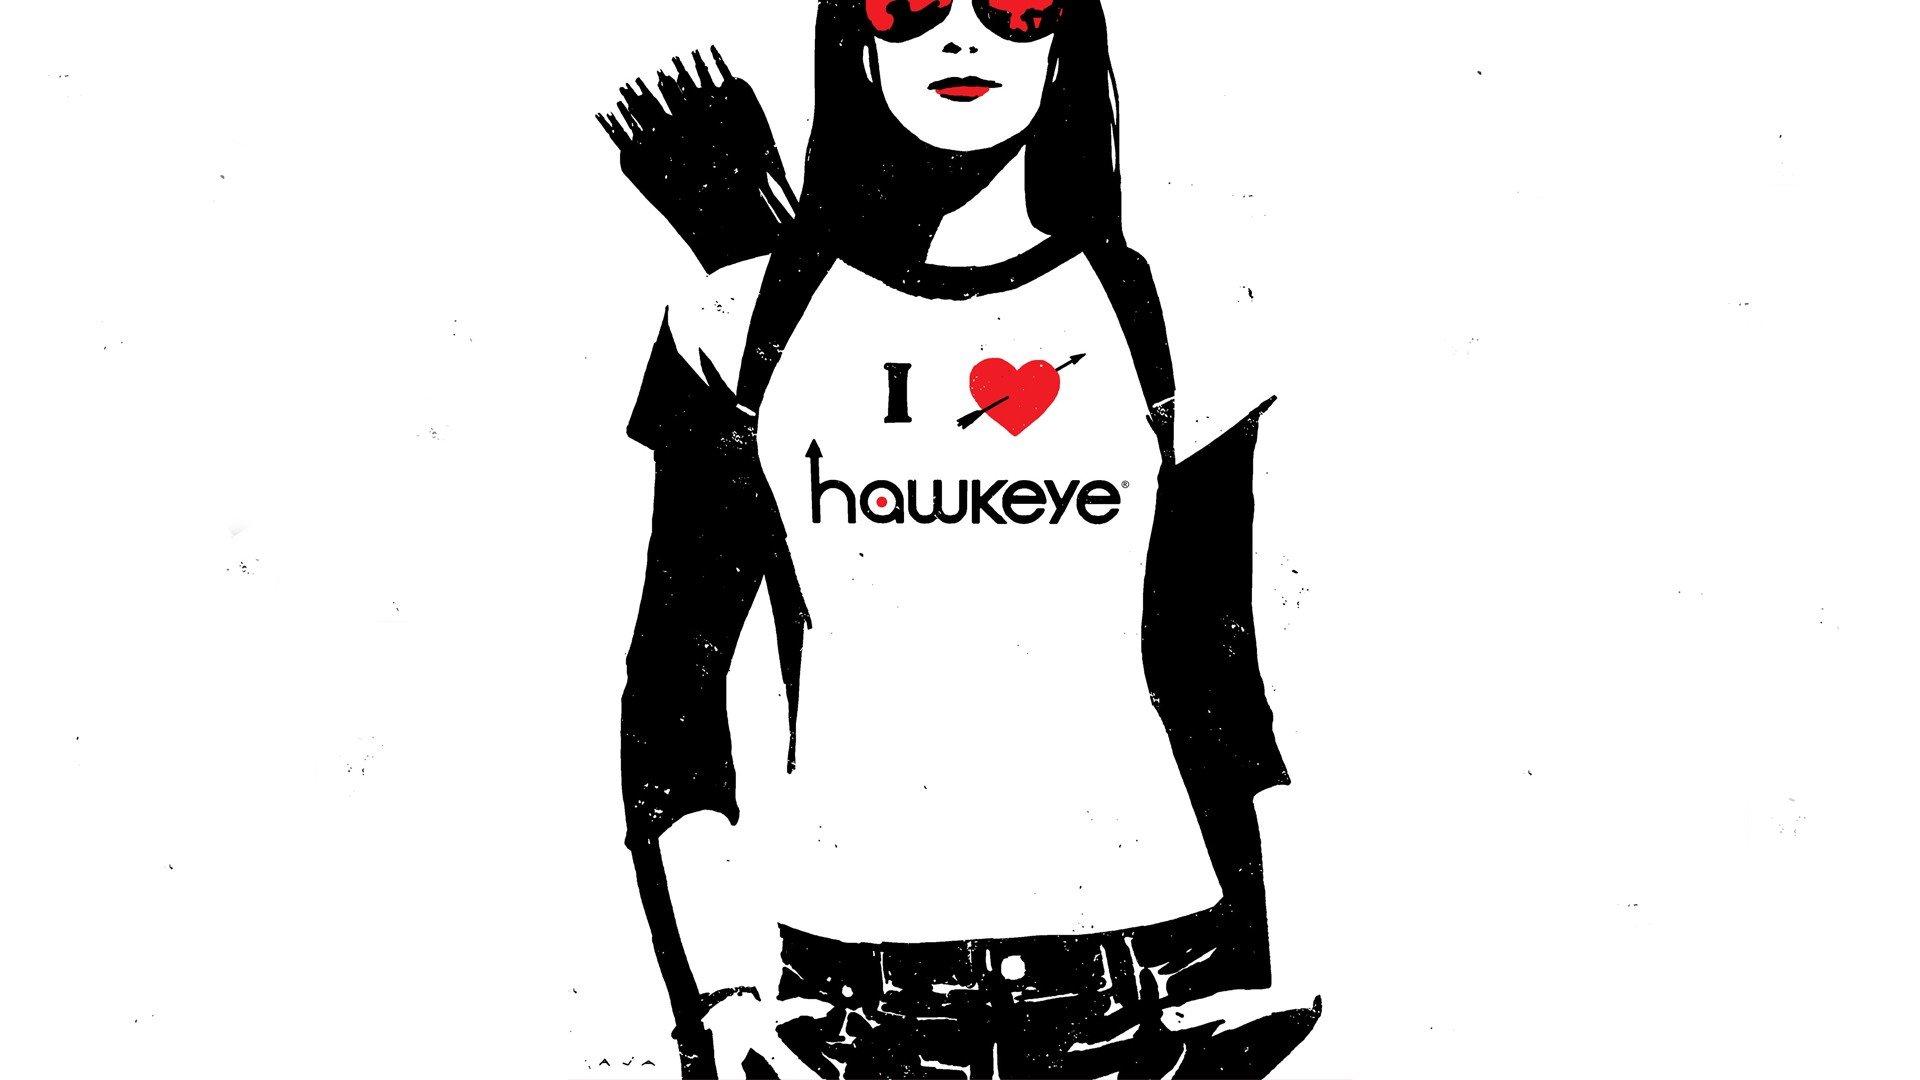 comics Marvel Comics Hawkeye Marvel NOW David Aja wallpaper background 1920x1080